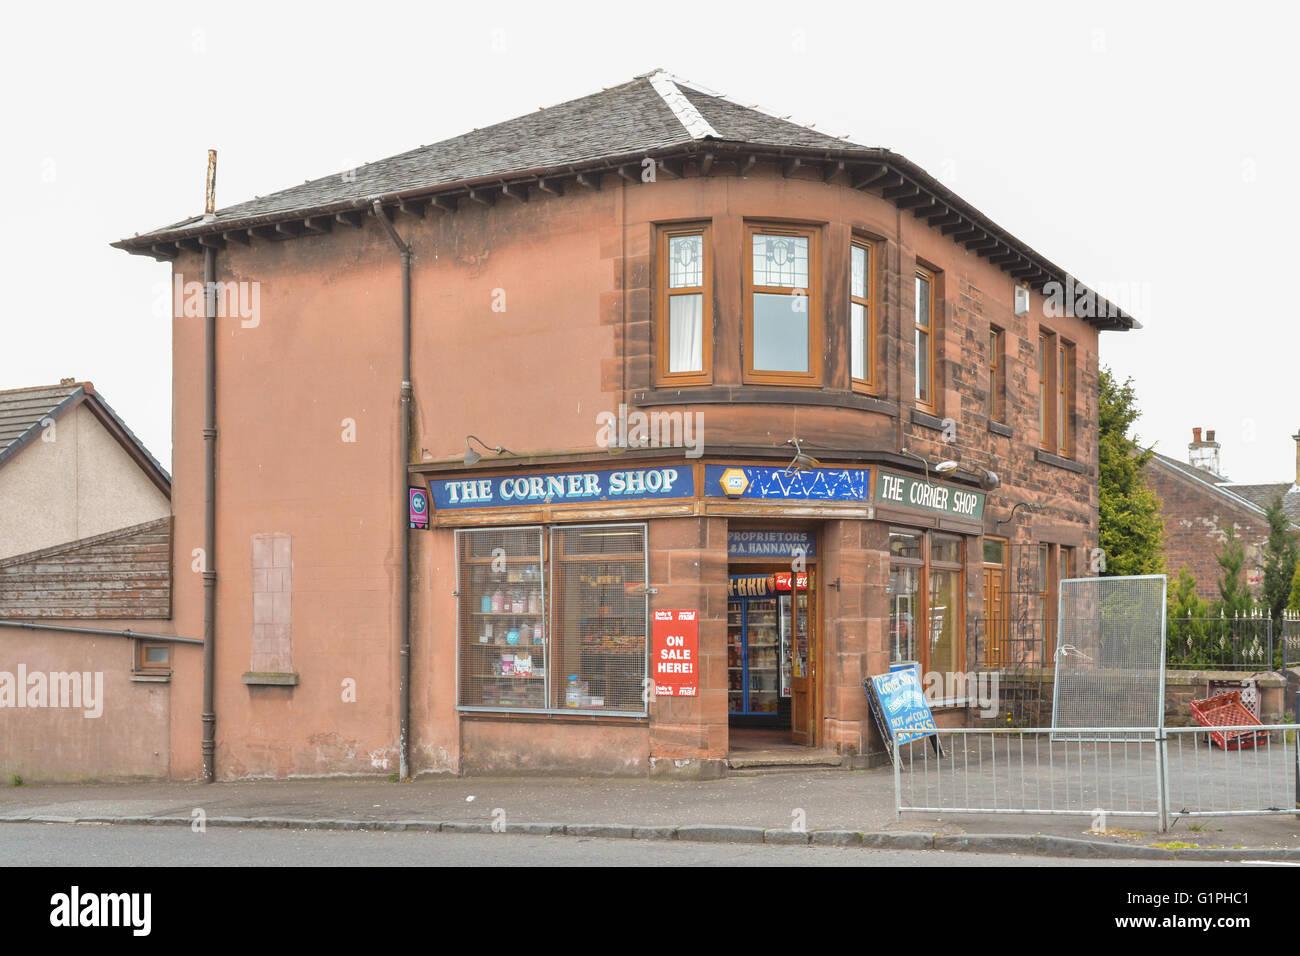 Traditional corner shop in Coatbridge, Scotland, UK - Stock Image